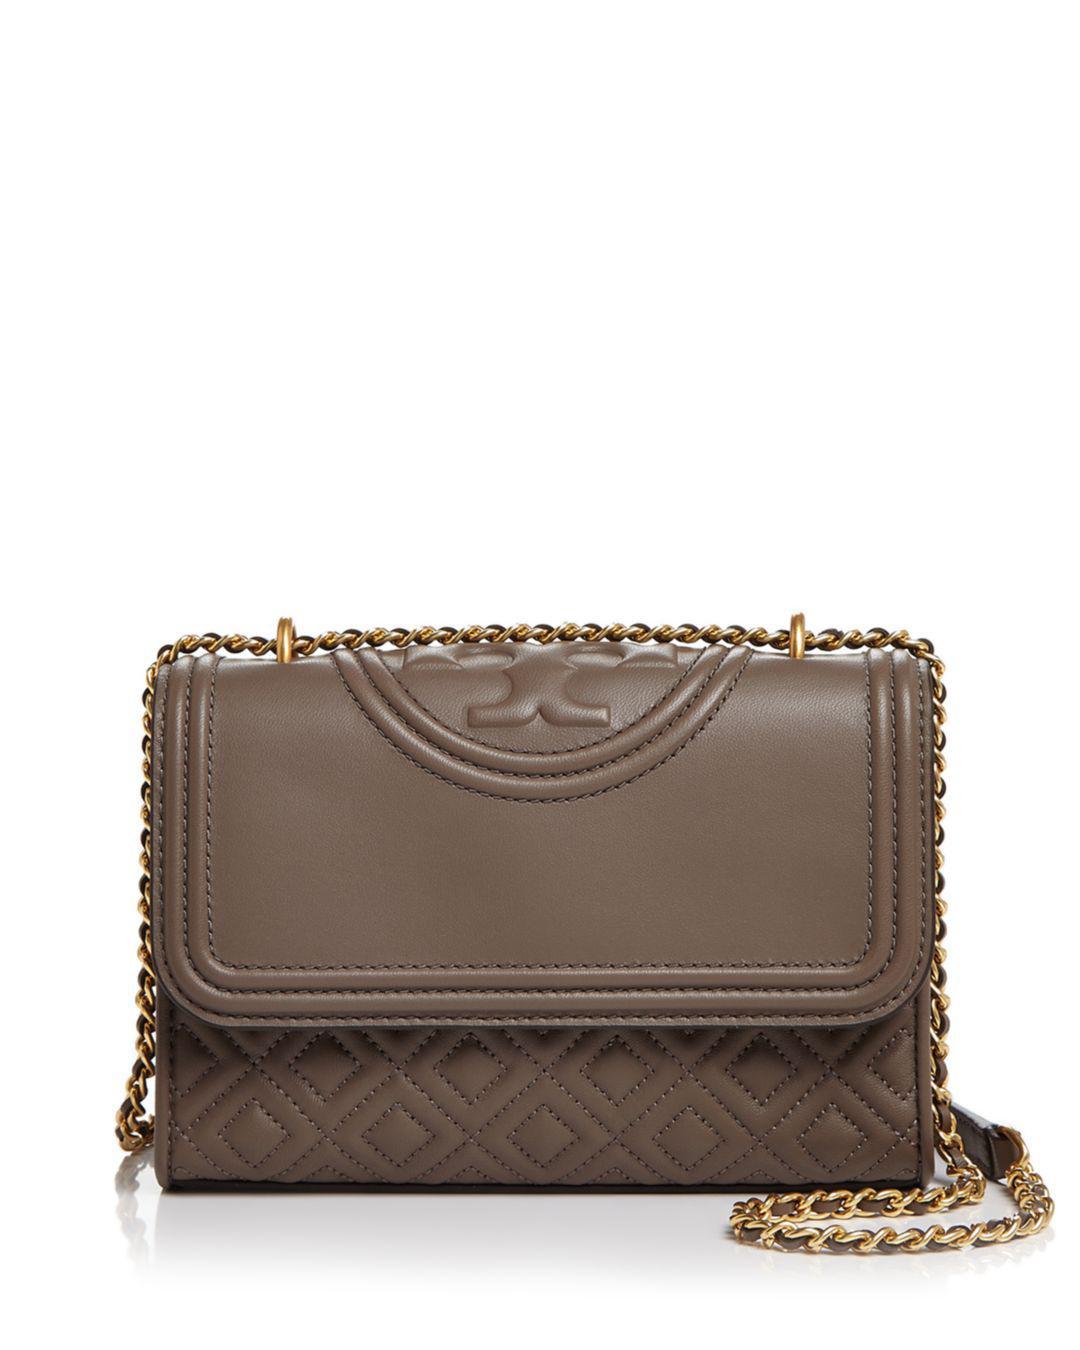 742a3f036b2e1 Tory Burch. Women s Fleming Convertible Small Leather Shoulder Bag